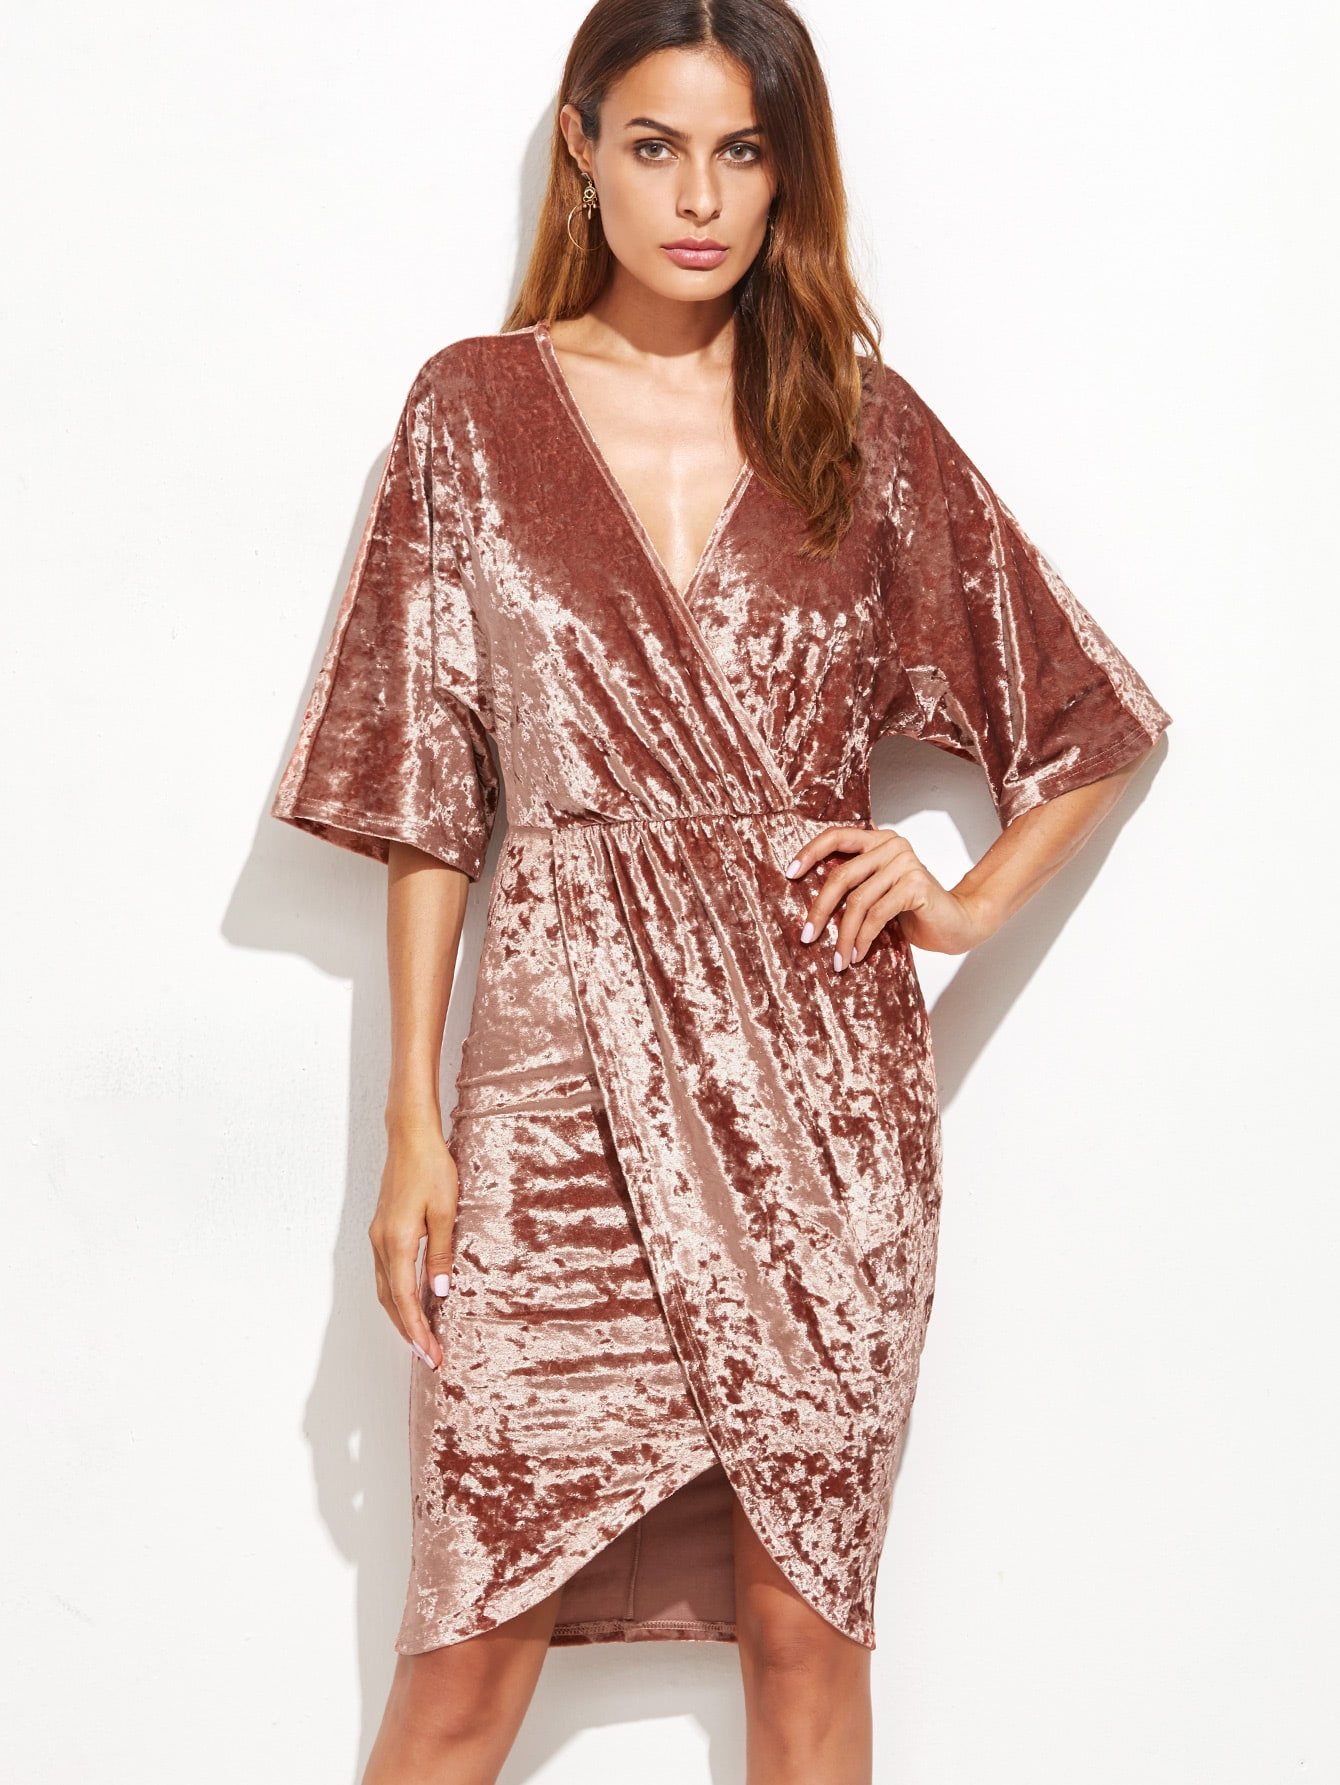 Brown Surplice Wrap Velvet Dress dress161020719